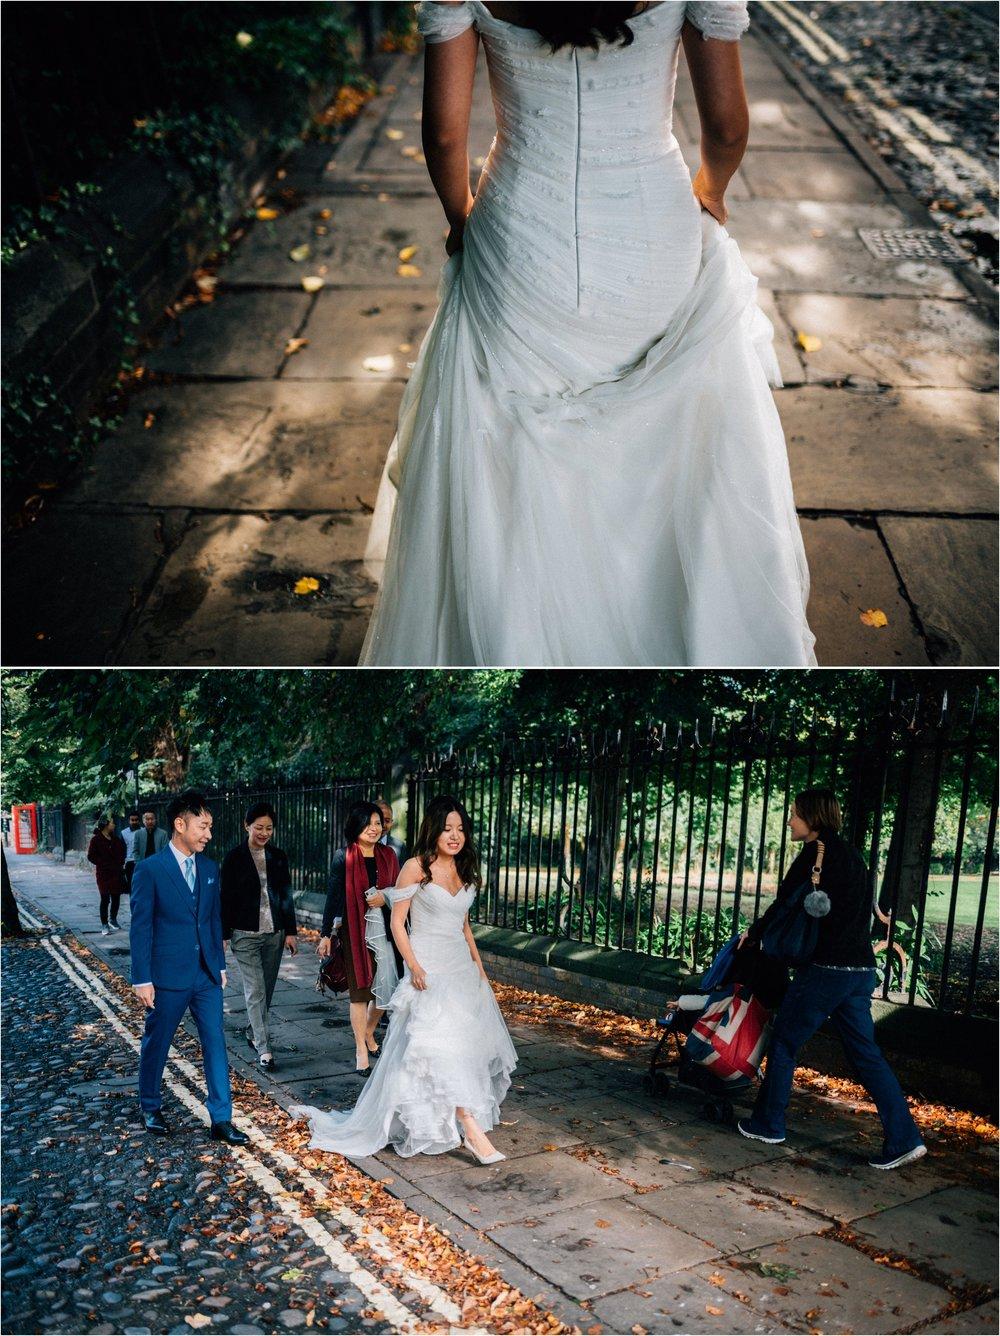 York city elopement wedding photographer_0055.jpg